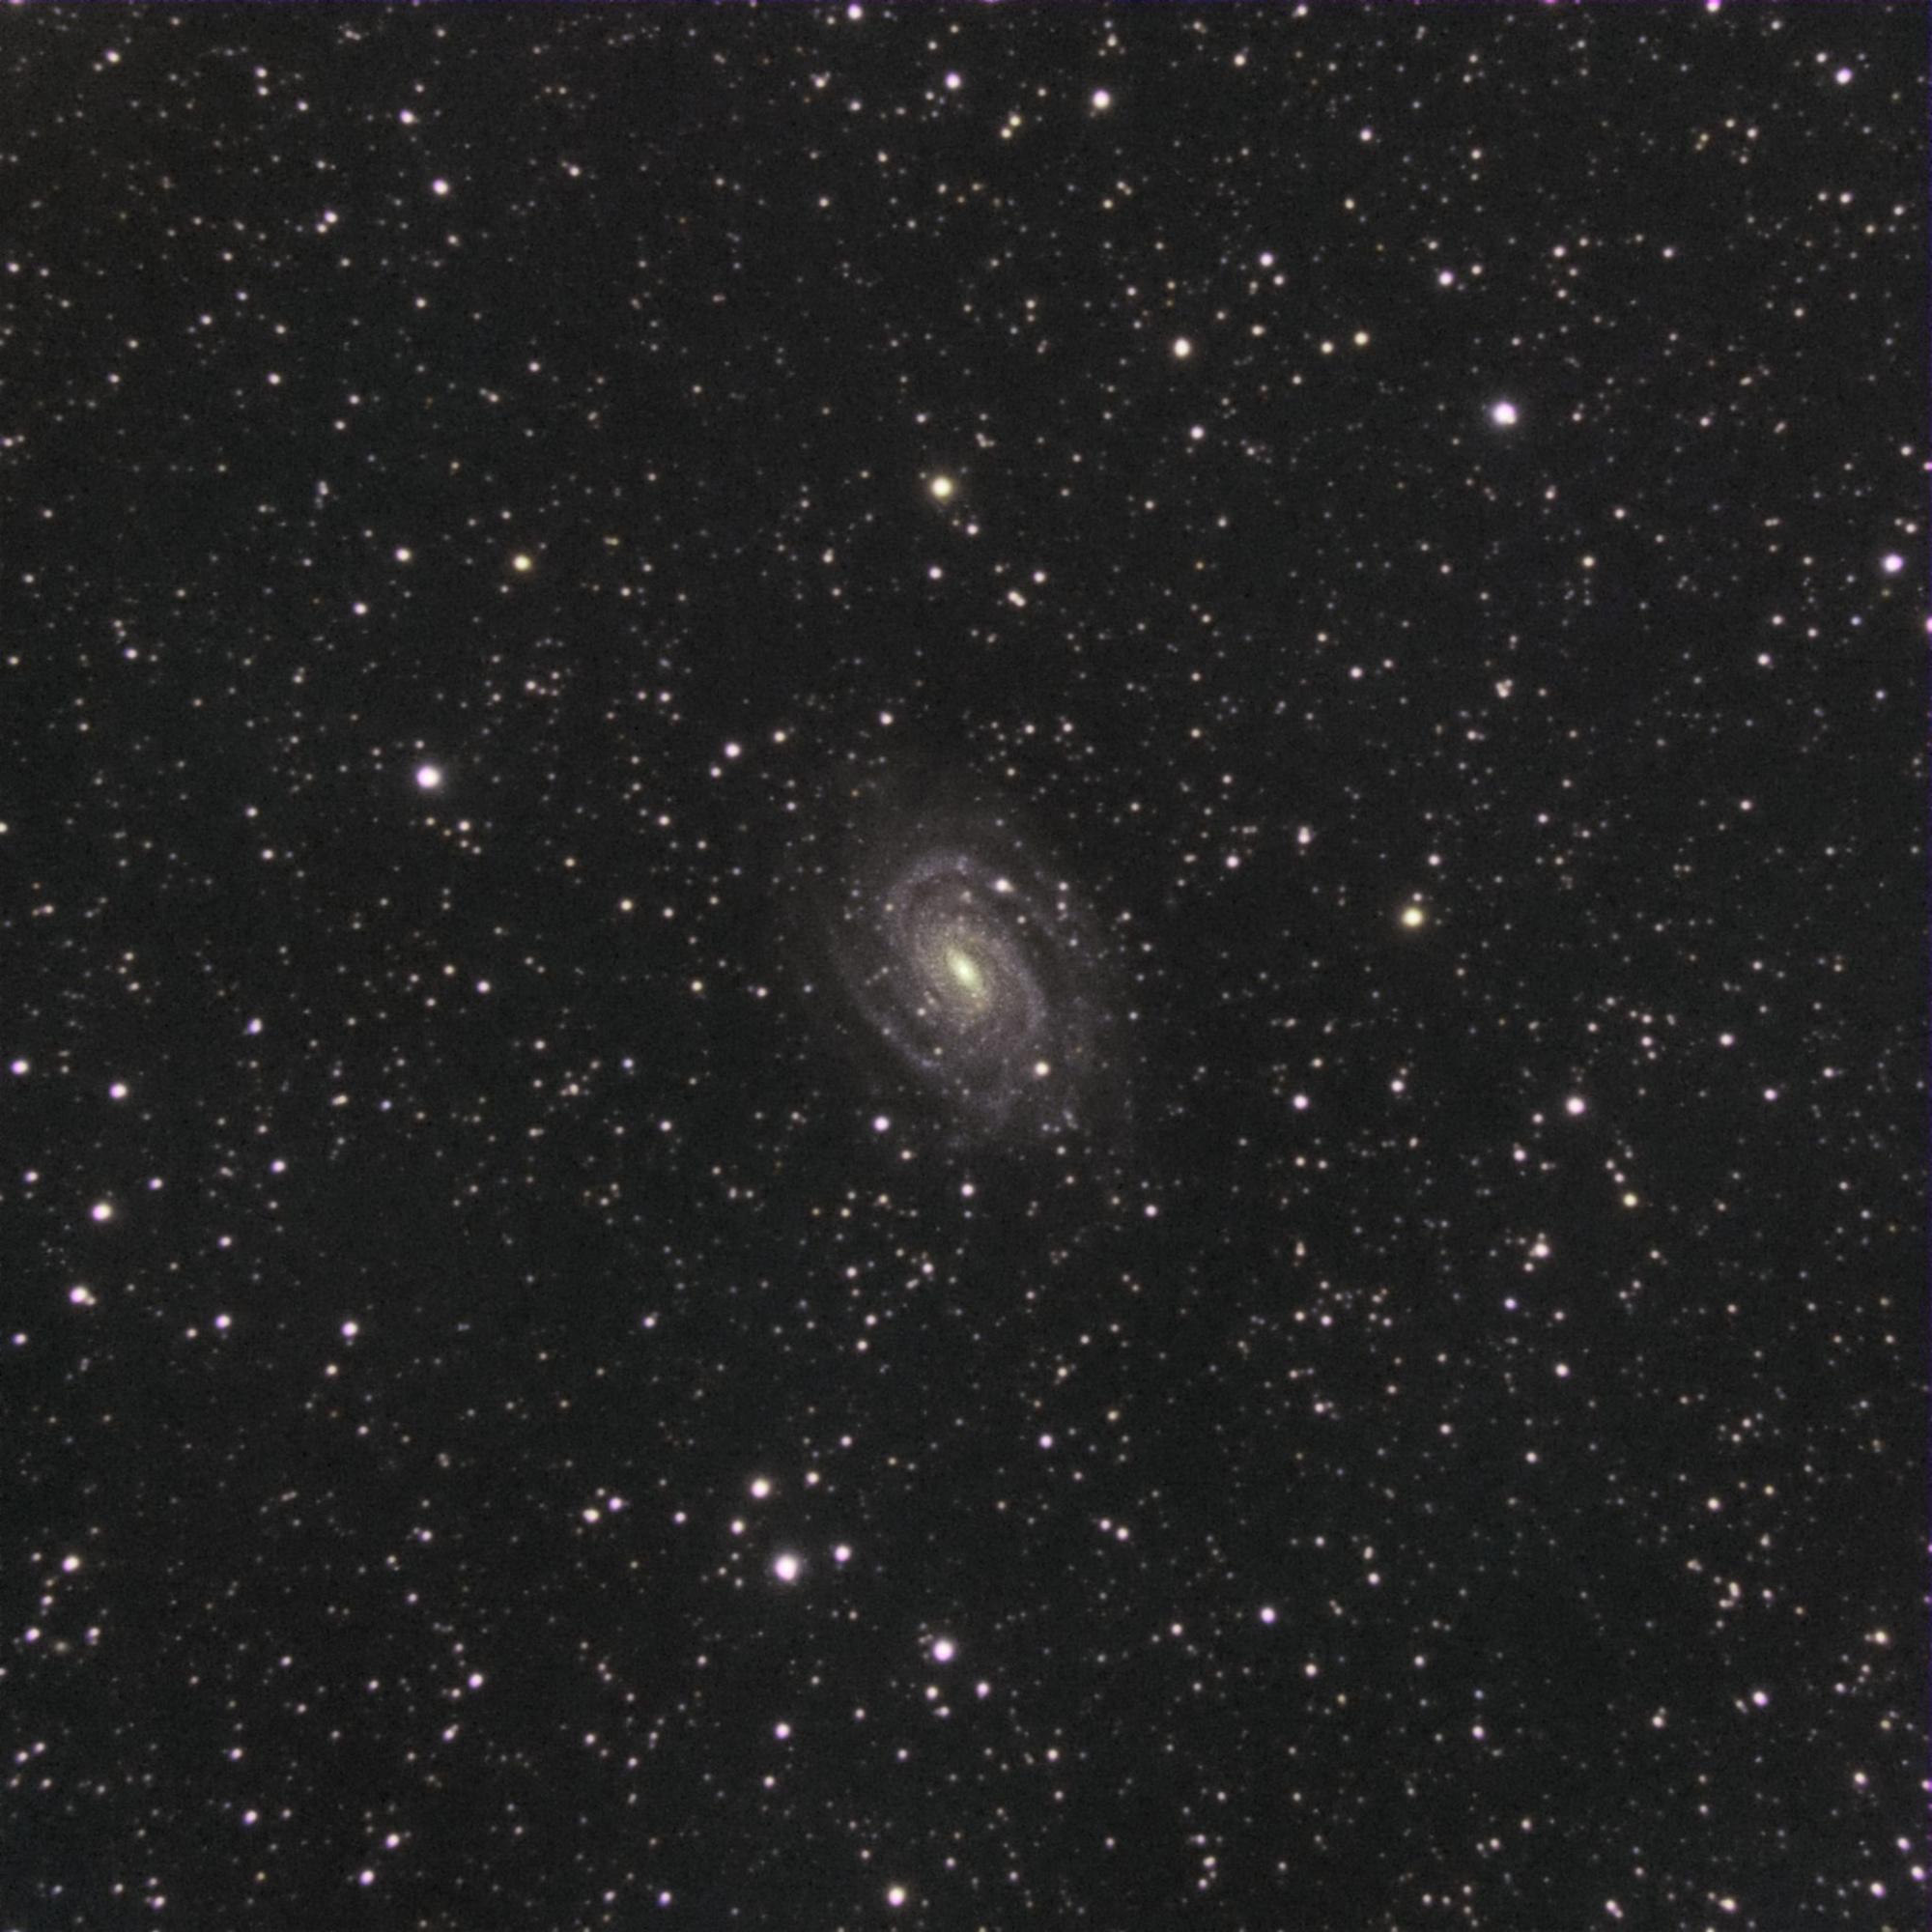 5c1cd5f40979b_NGC6384.thumb.jpg.c24a532dc87f385b56dfa10bc8e8785e.jpg